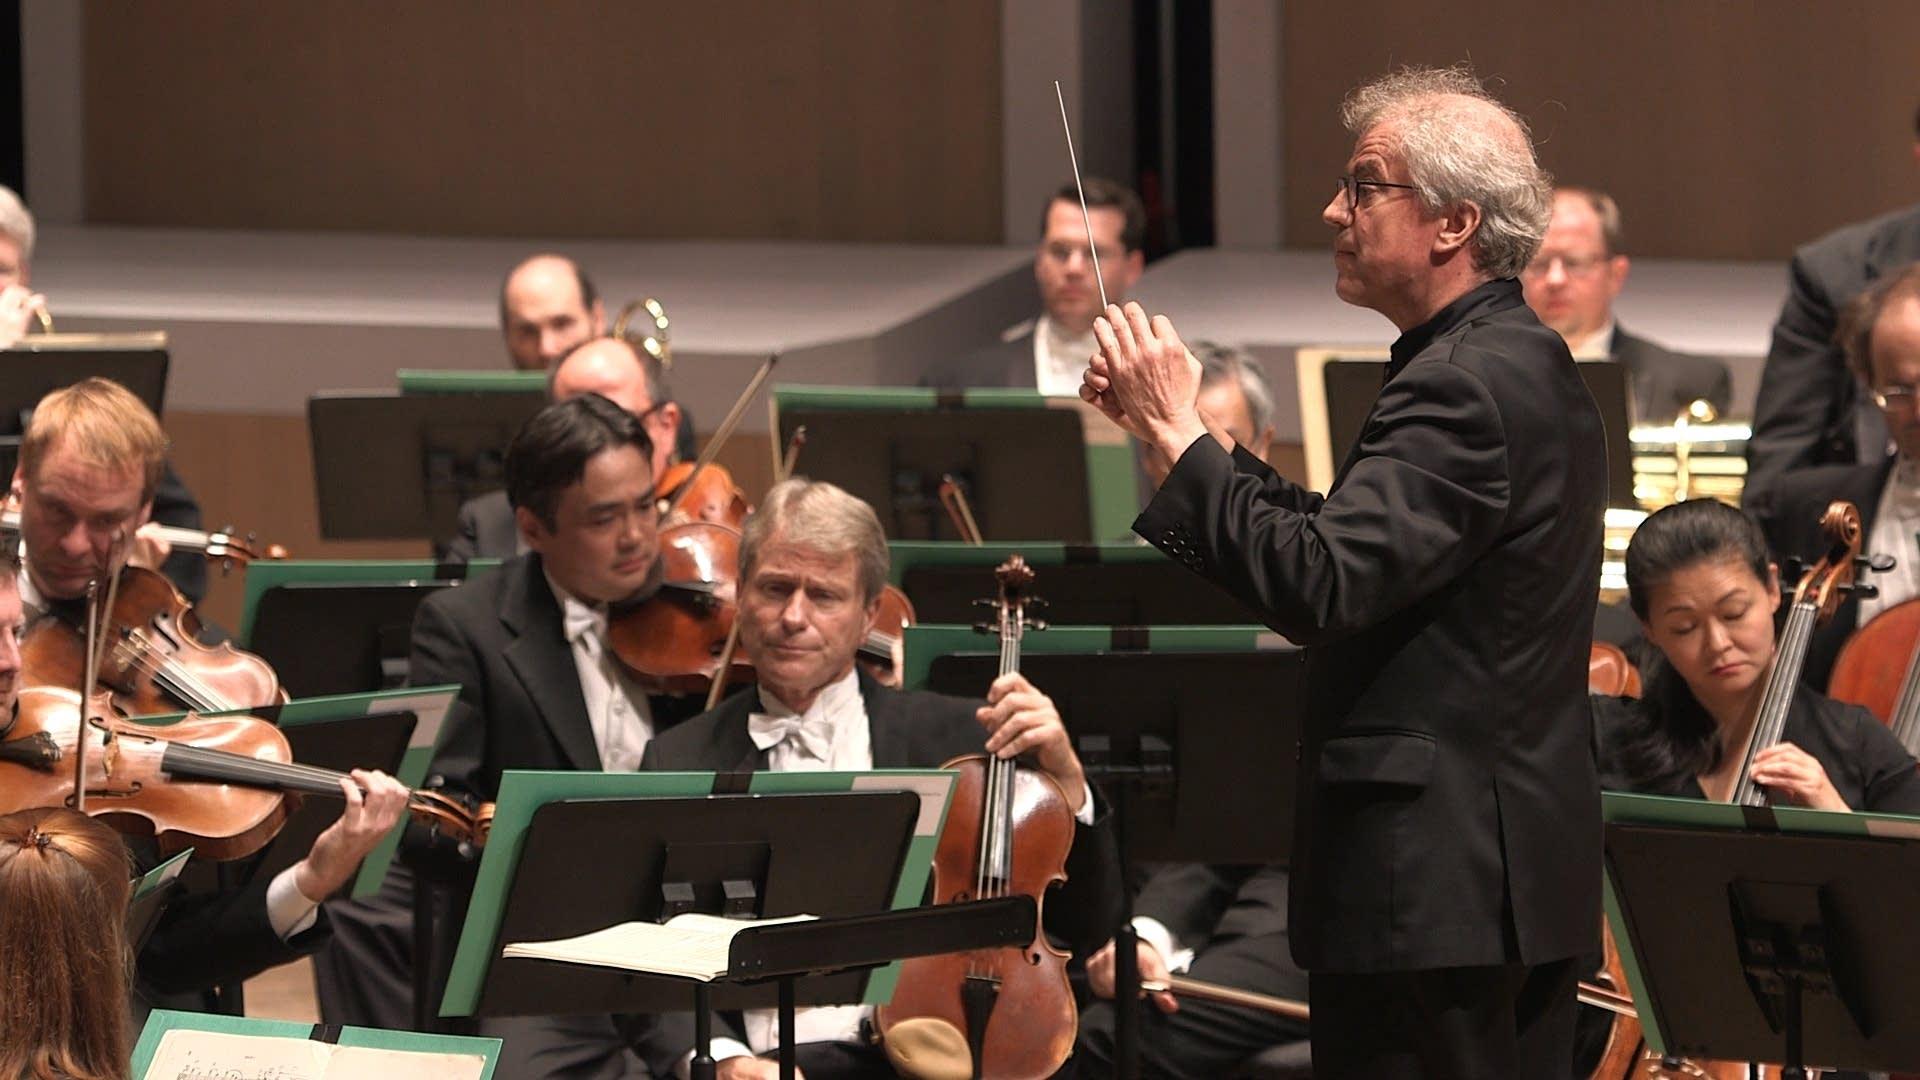 osmo vanska, musicians of the minnesota orchestra